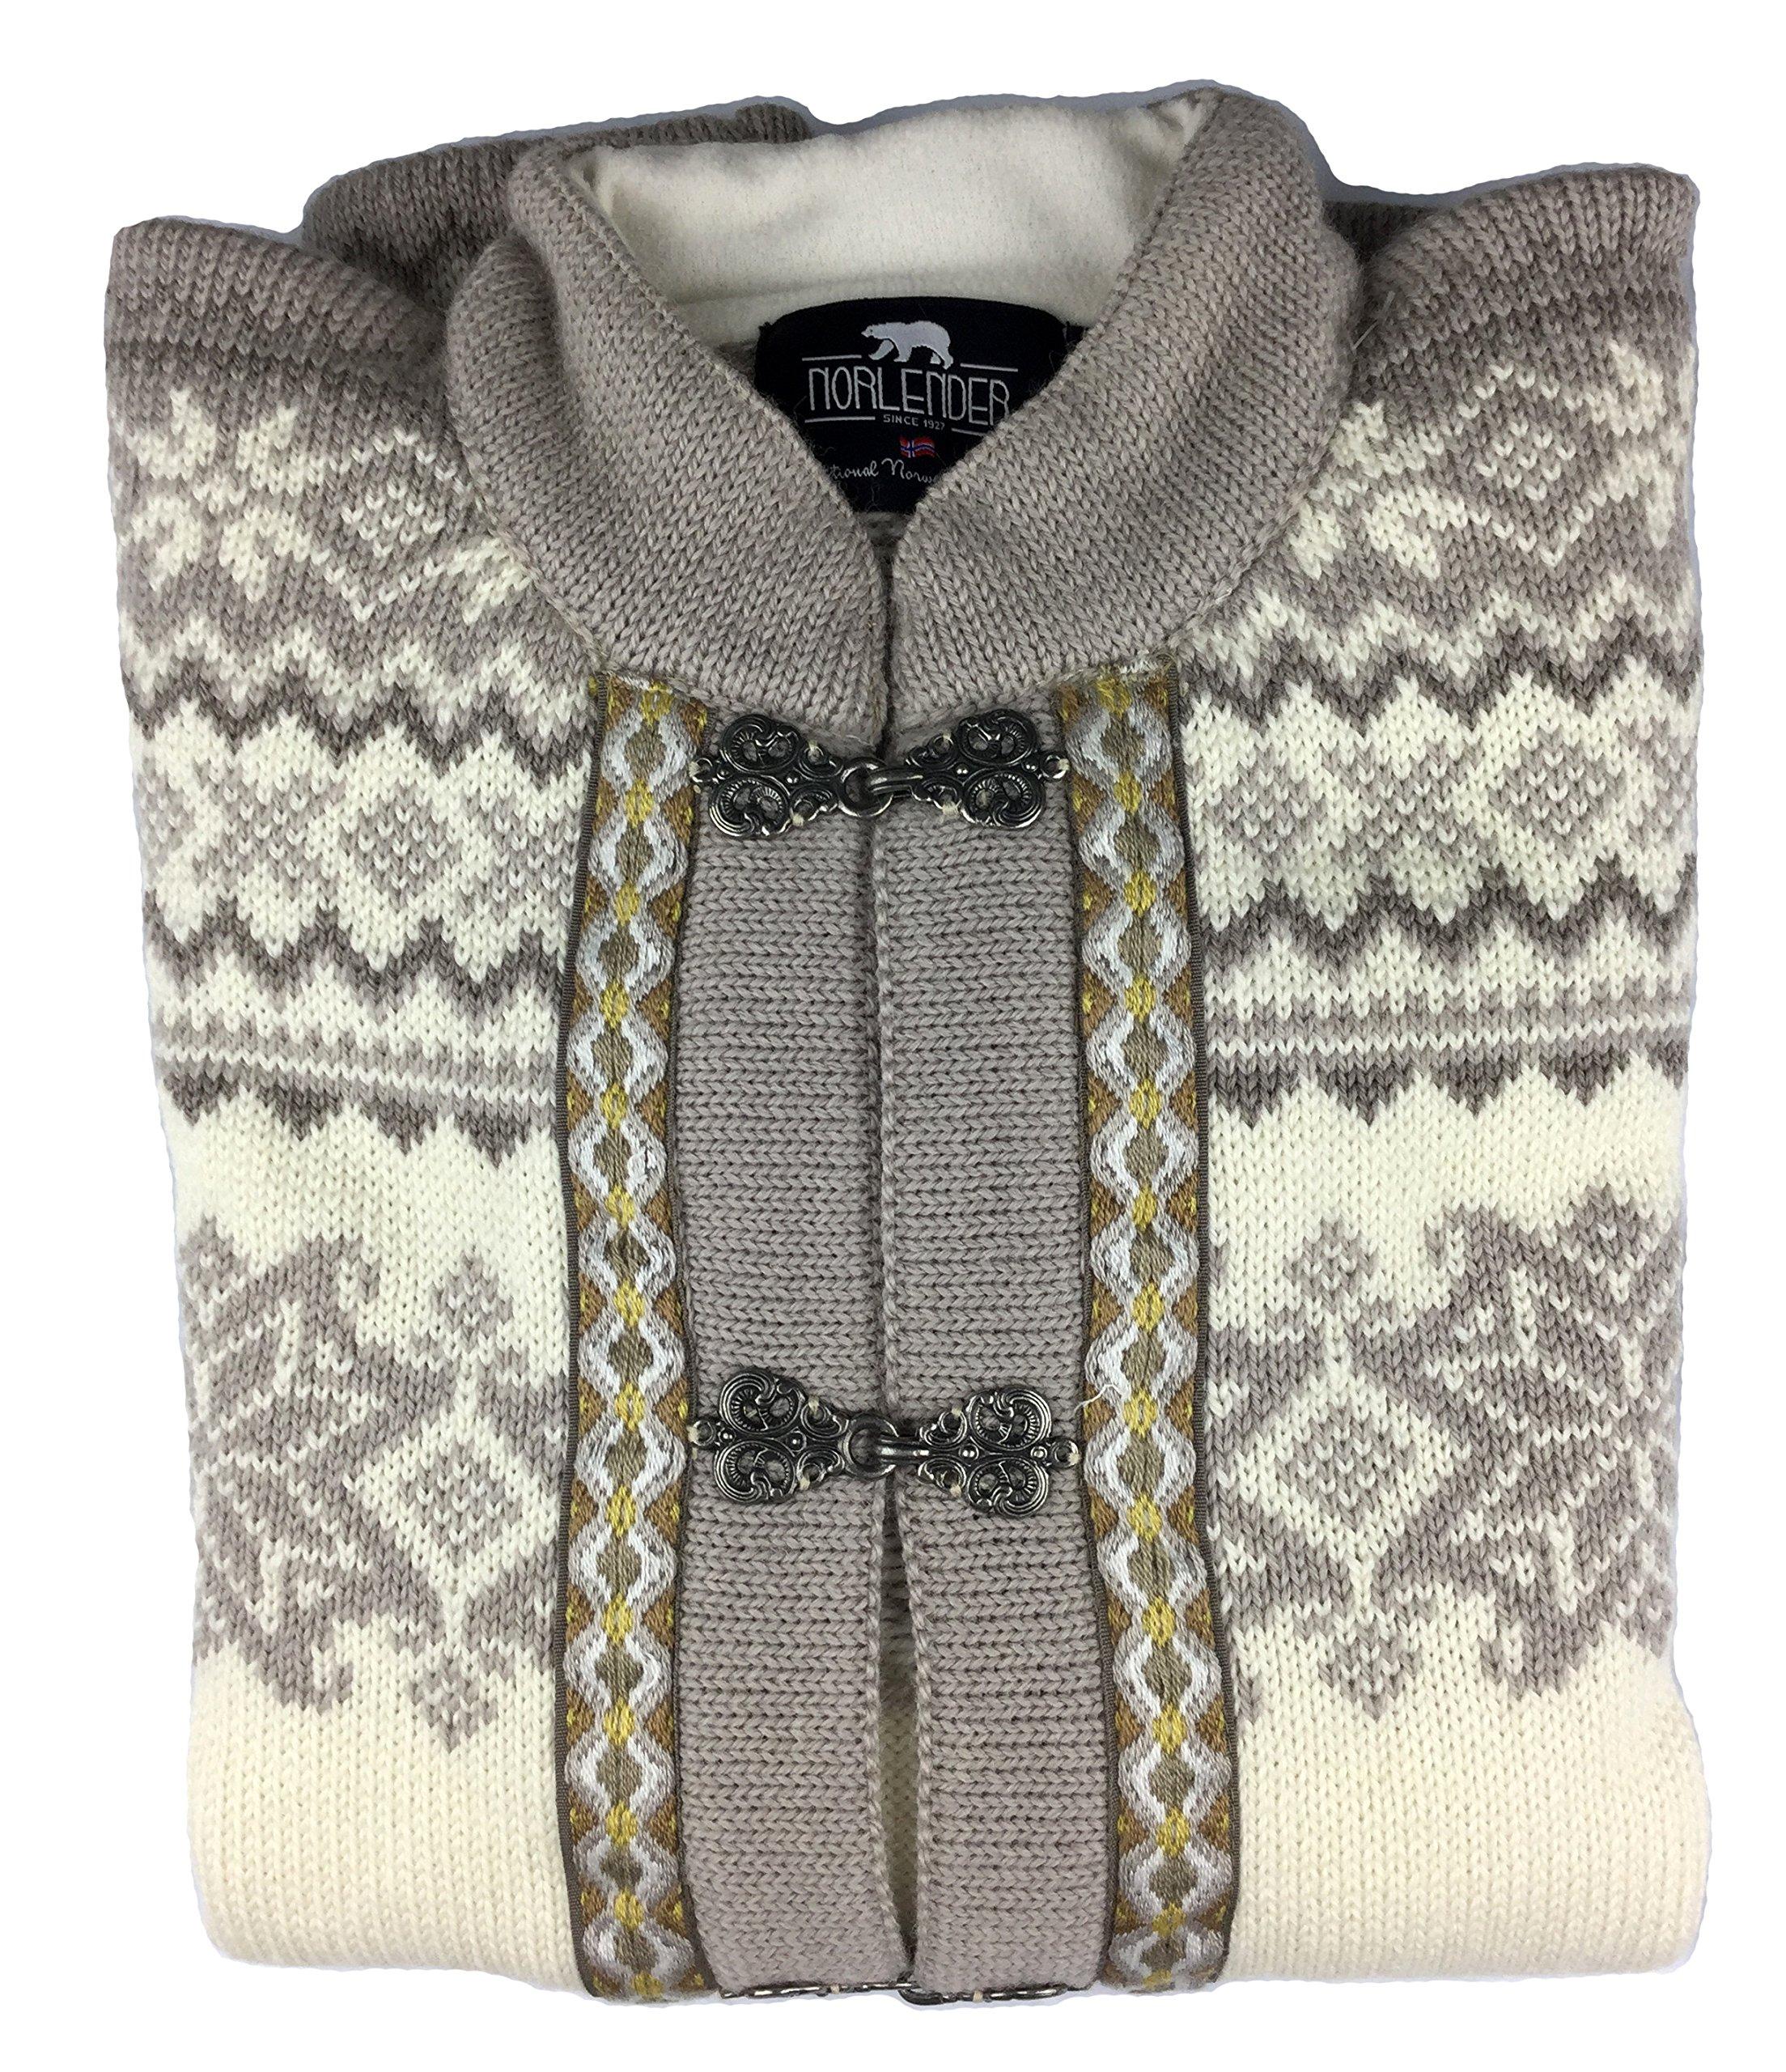 Norlender Norwegian 100% Wool Voss Cardigan Sweater w/ FREE $75 Norlender 100% Wool Scarf by Norlender